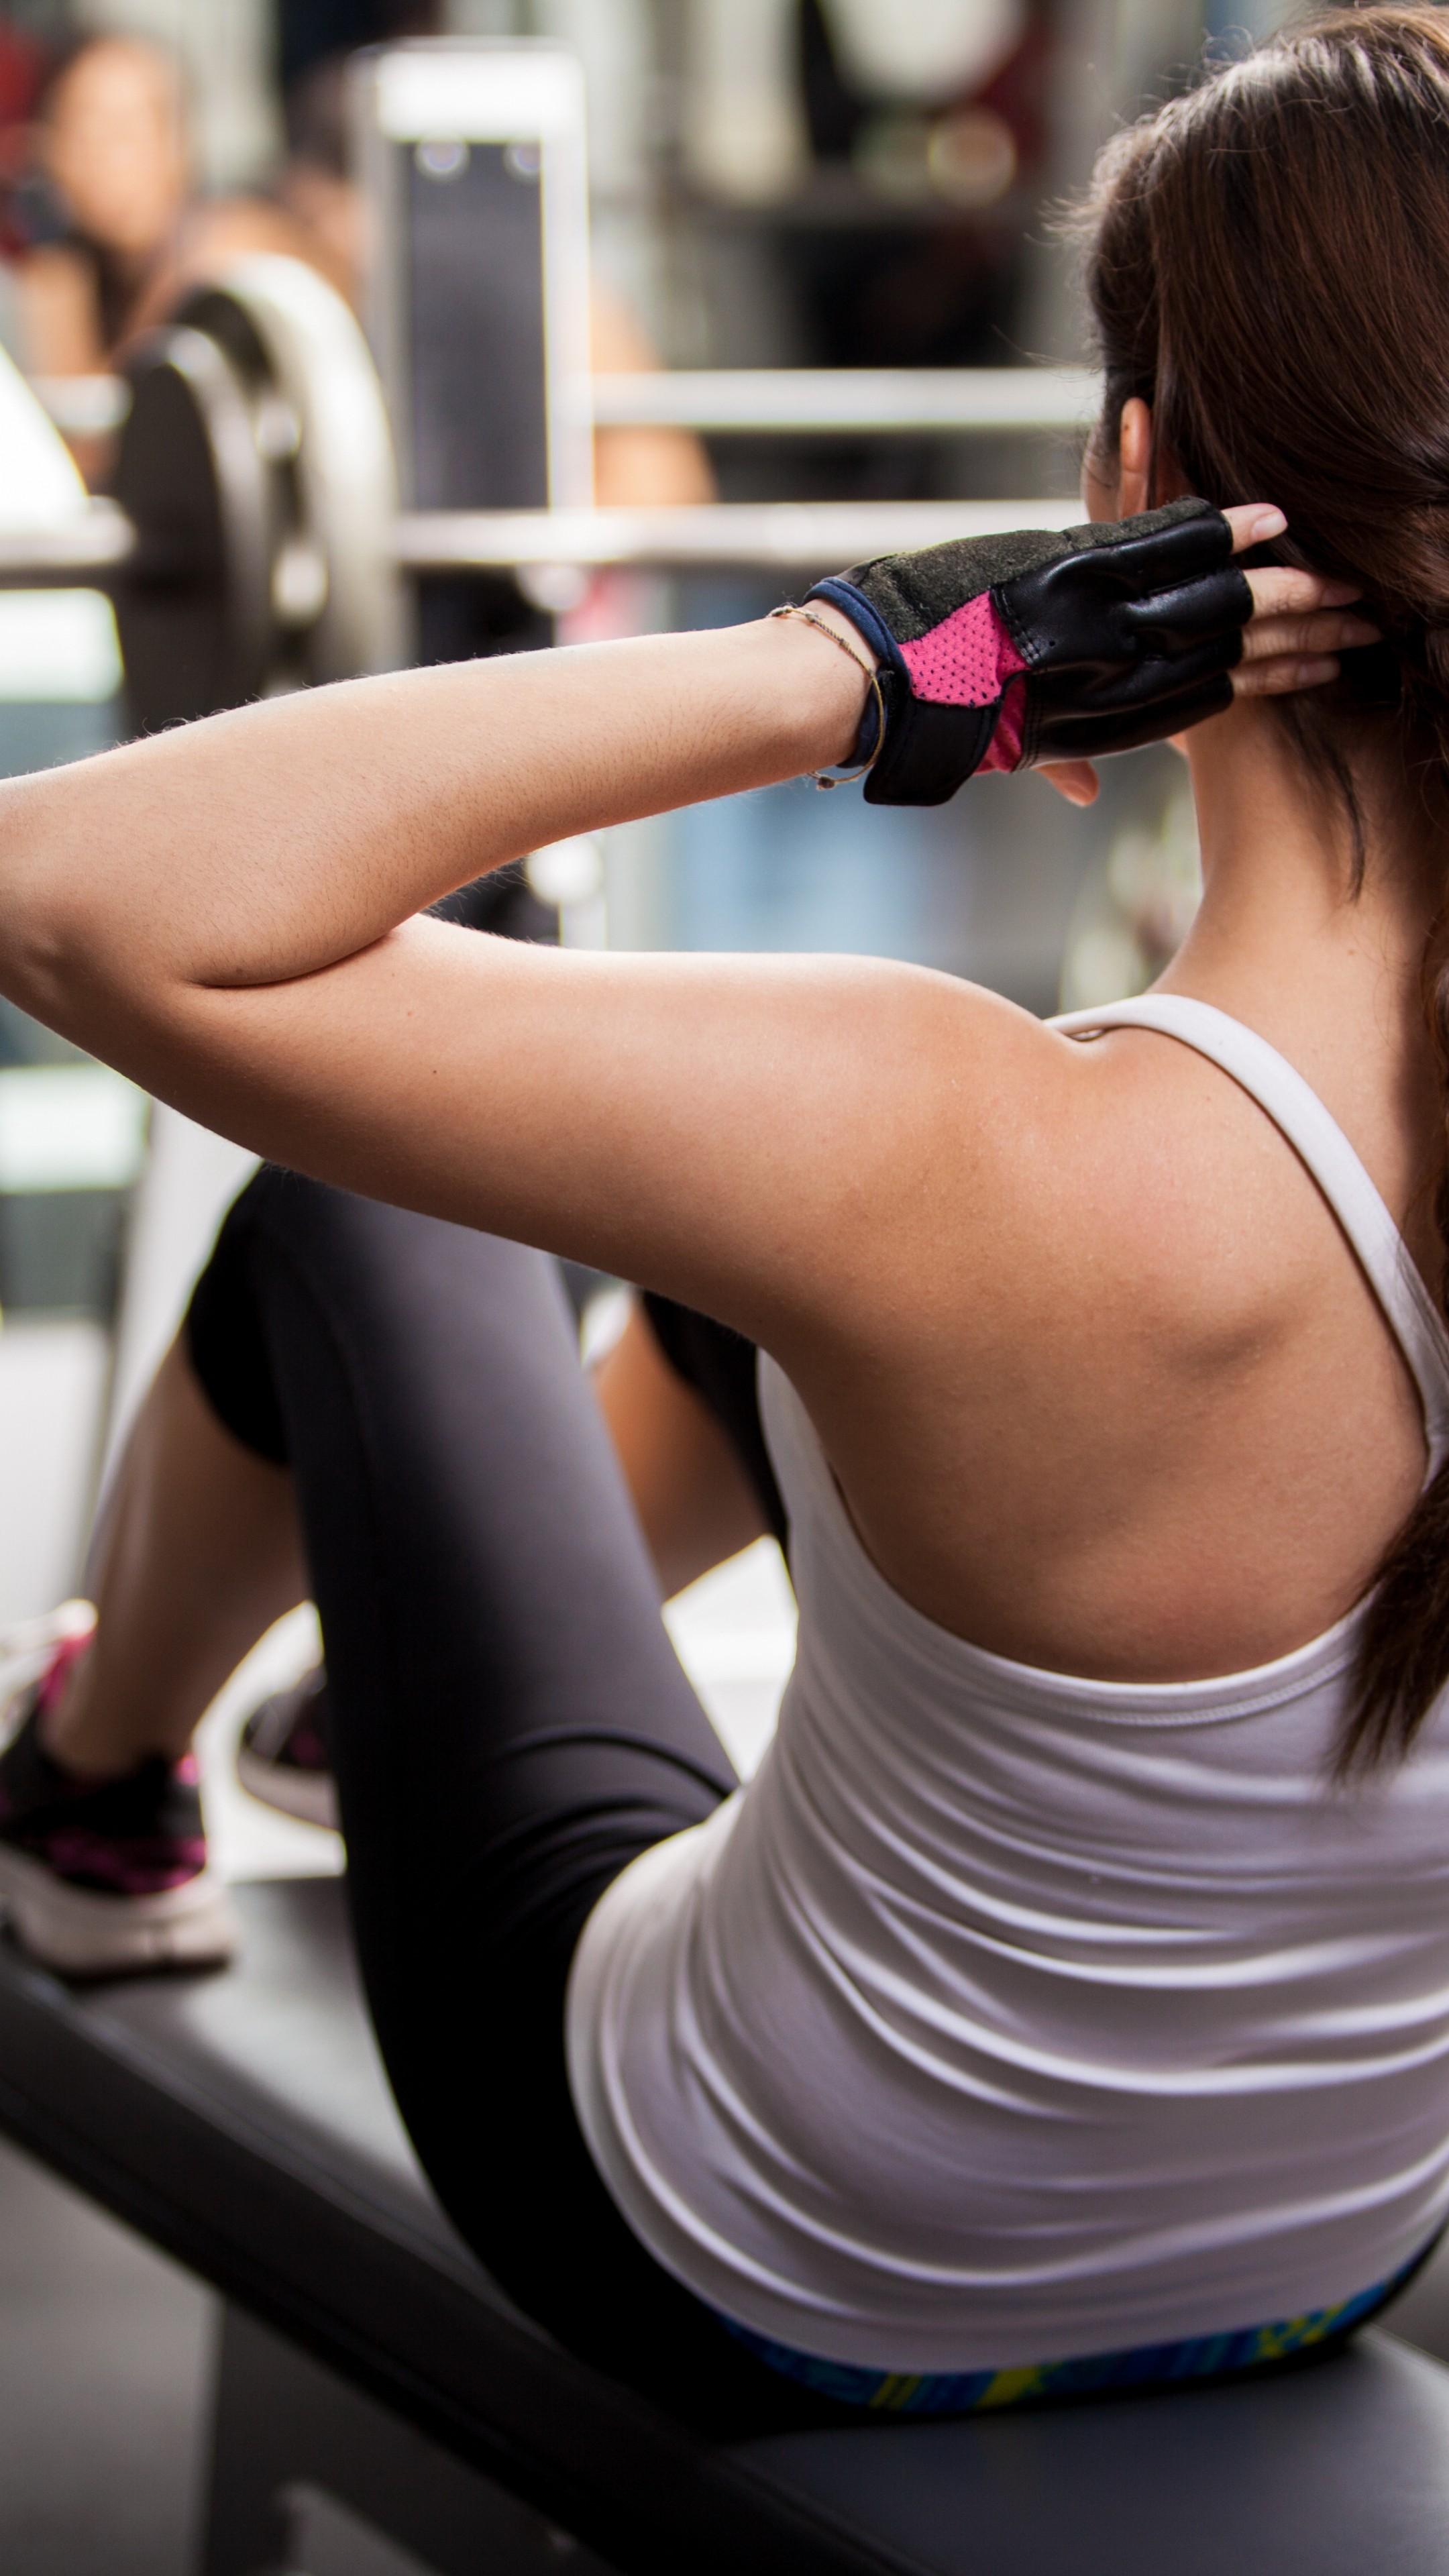 Wallpaper Girl, fitness, exercise, gym, dumbbells, workout